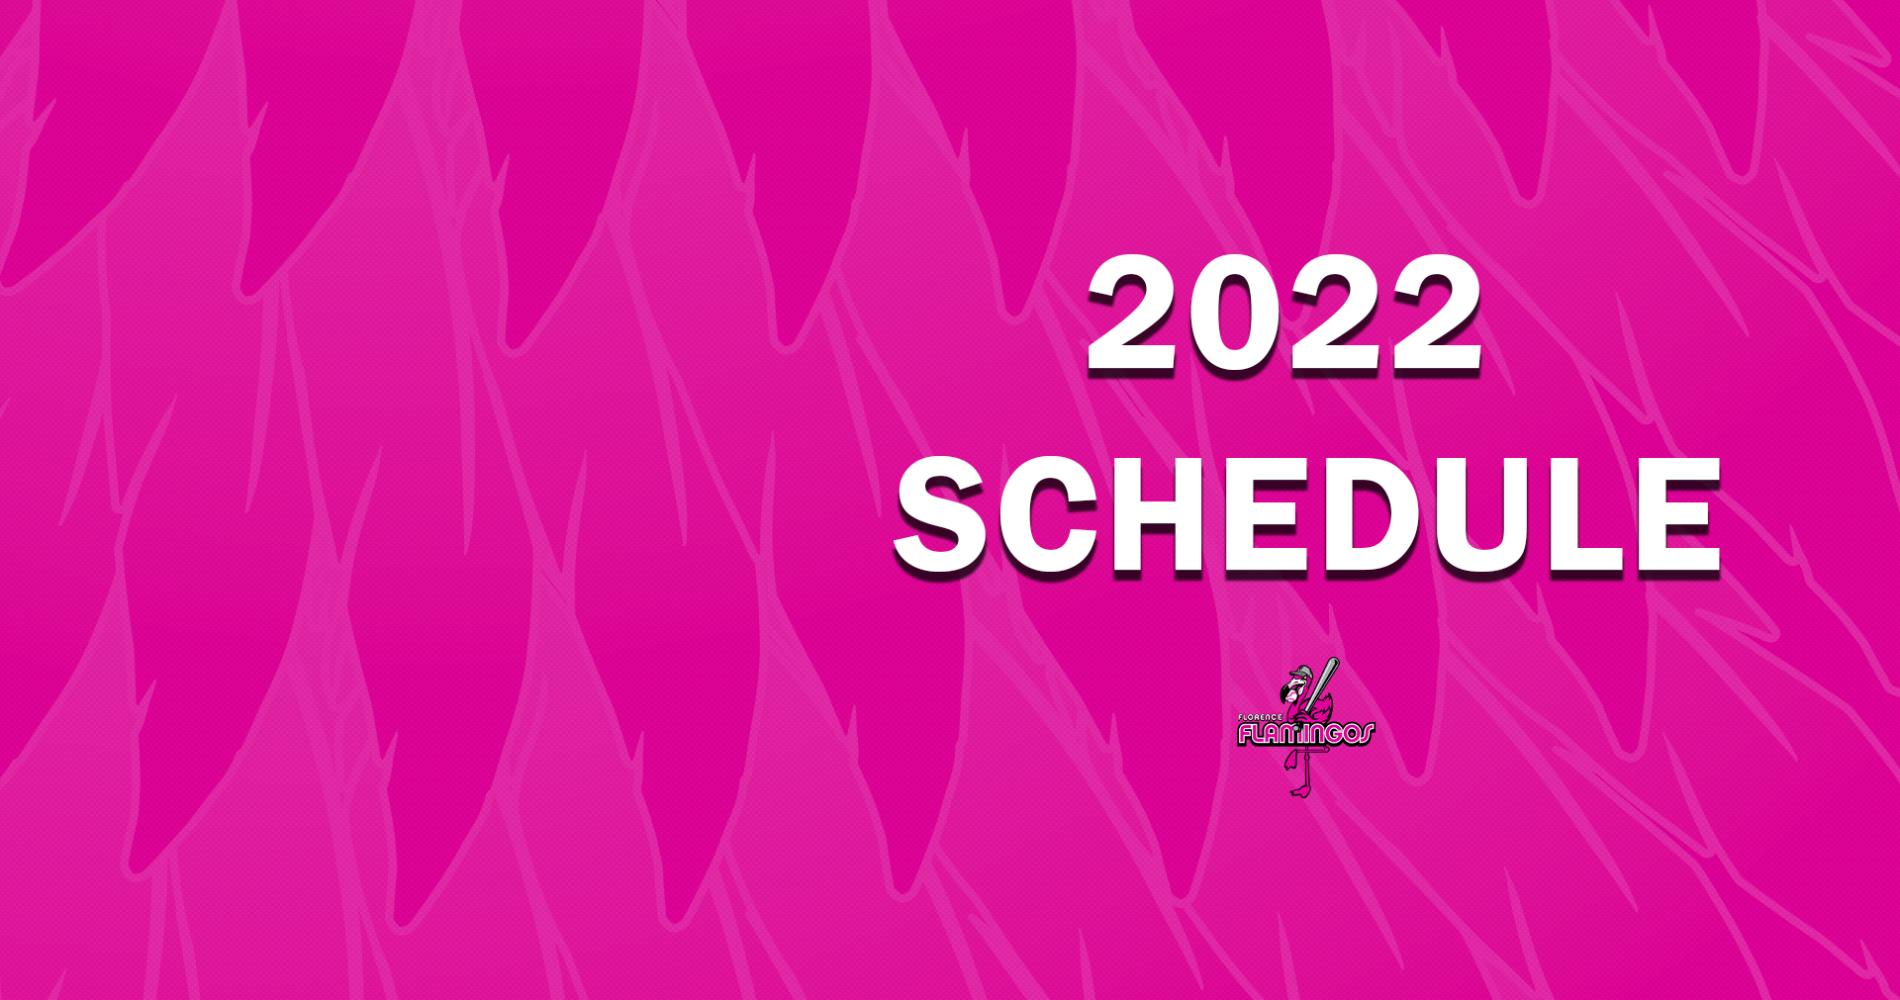 Flamingos announce 2022 schedule